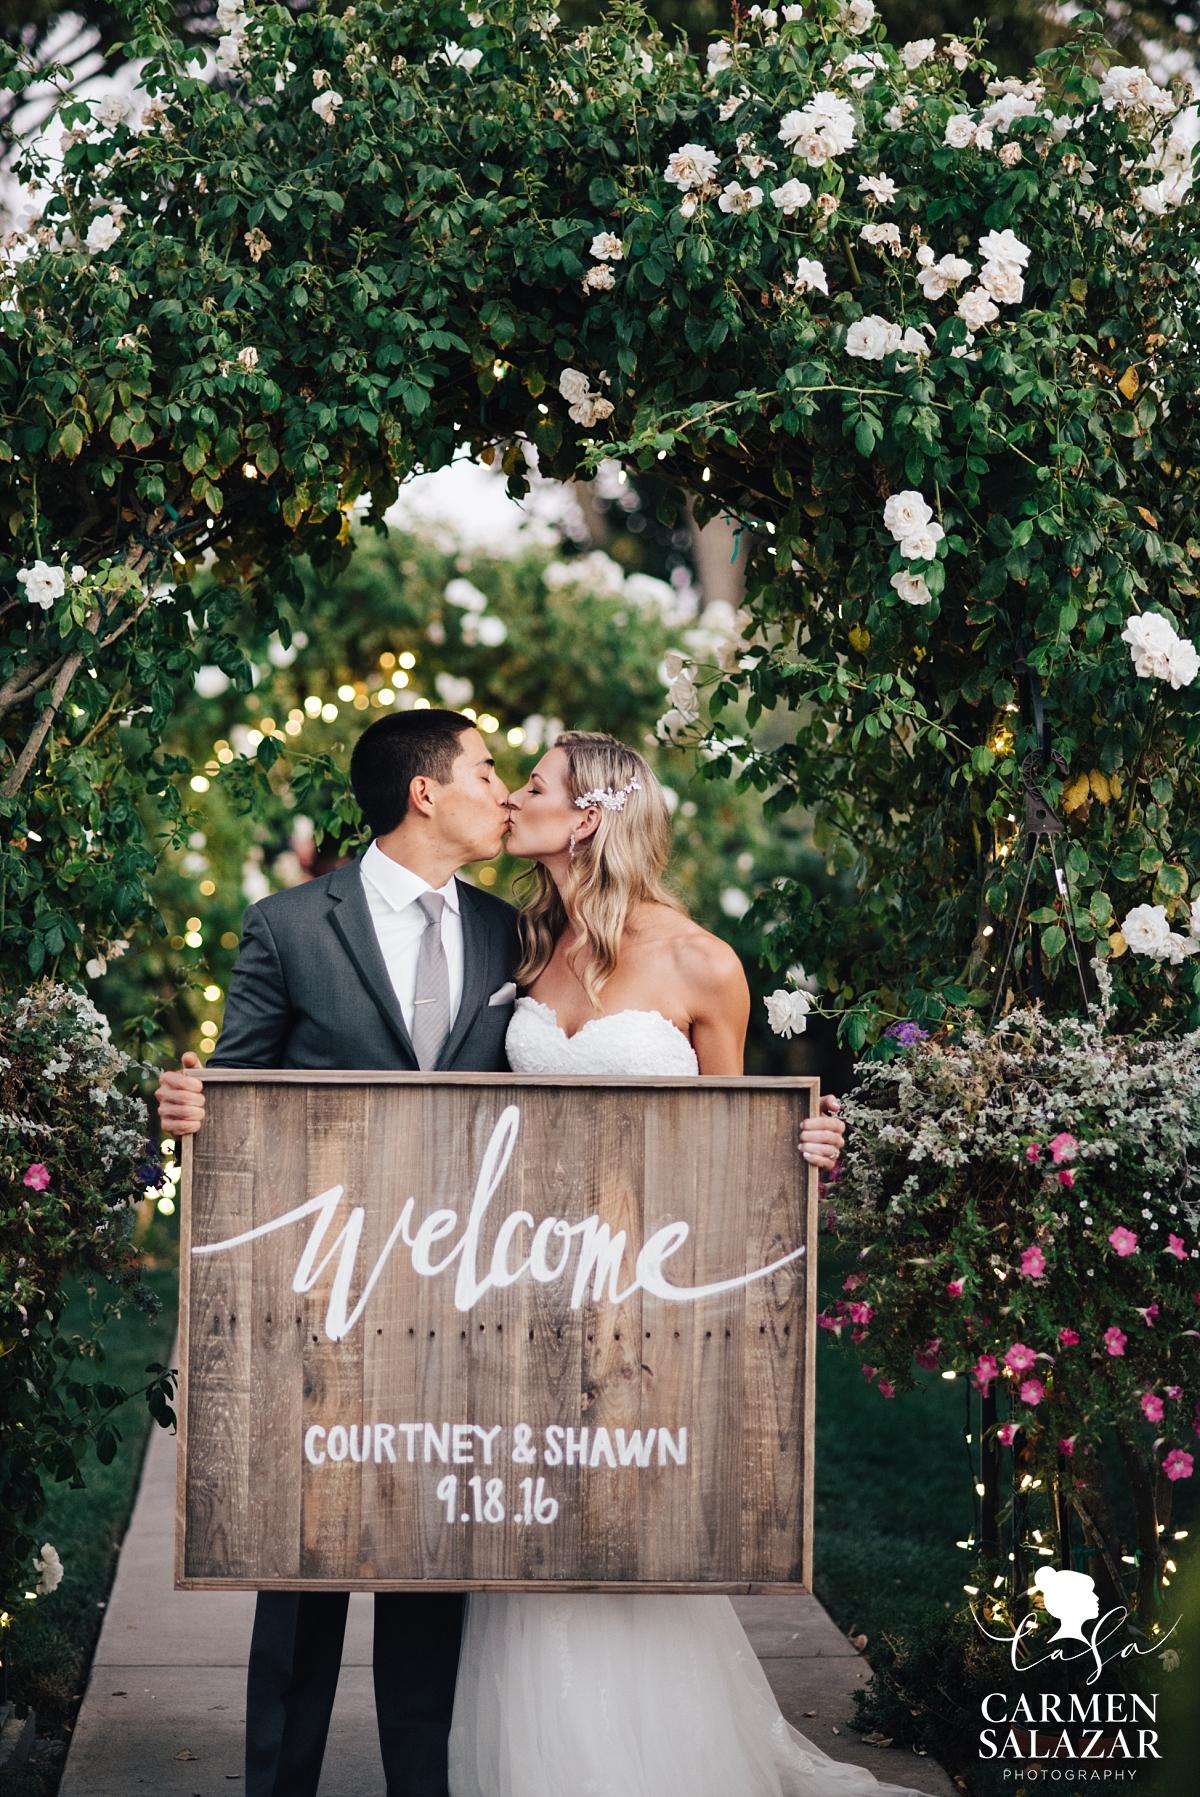 DIY wood wedding welcome sign - Carmen Salazar